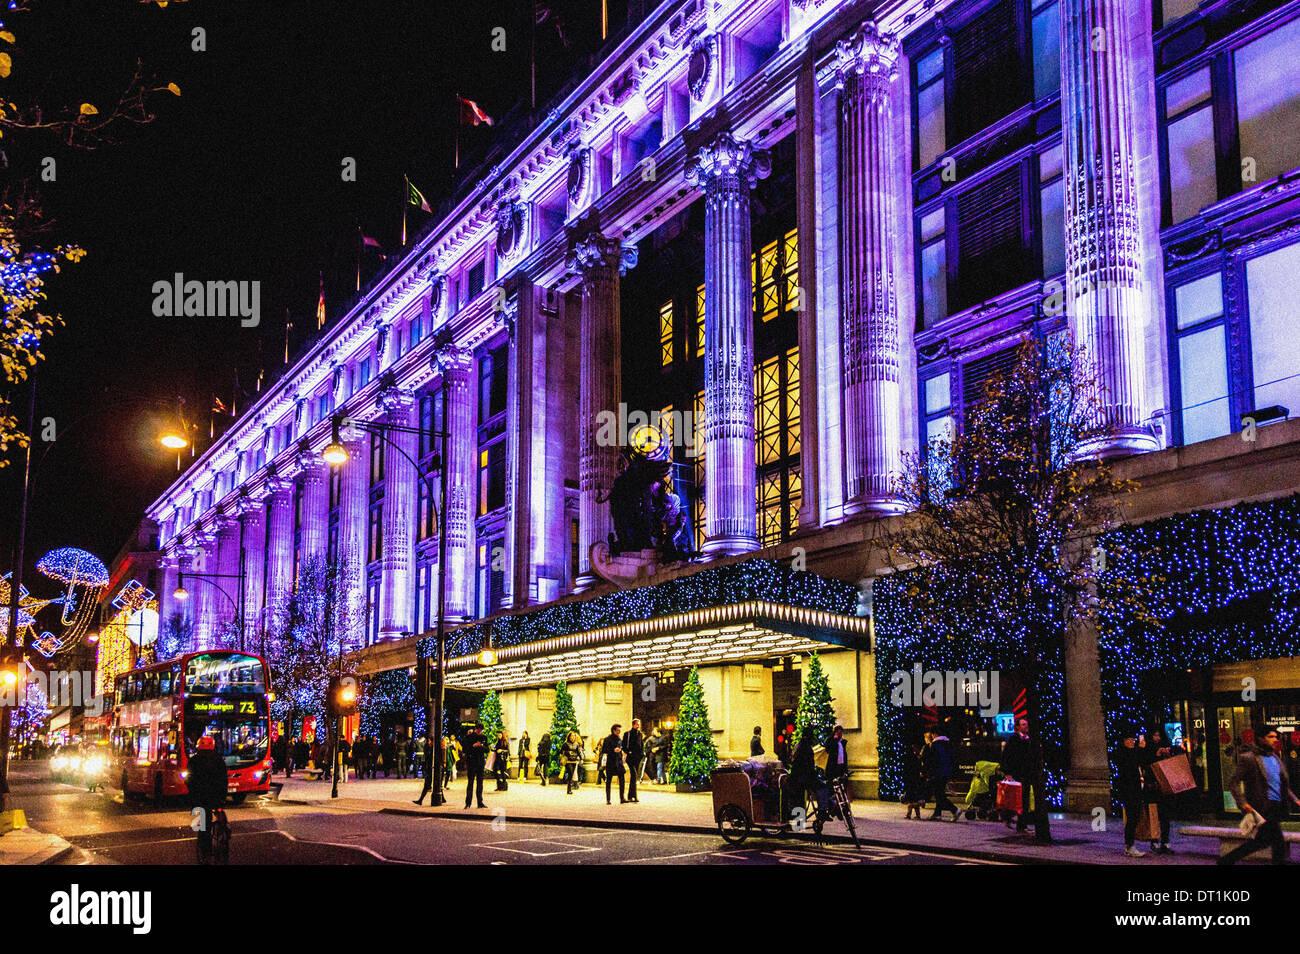 Selfridges department store, Oxford Street, London, UK, at Christmas. - Stock Image